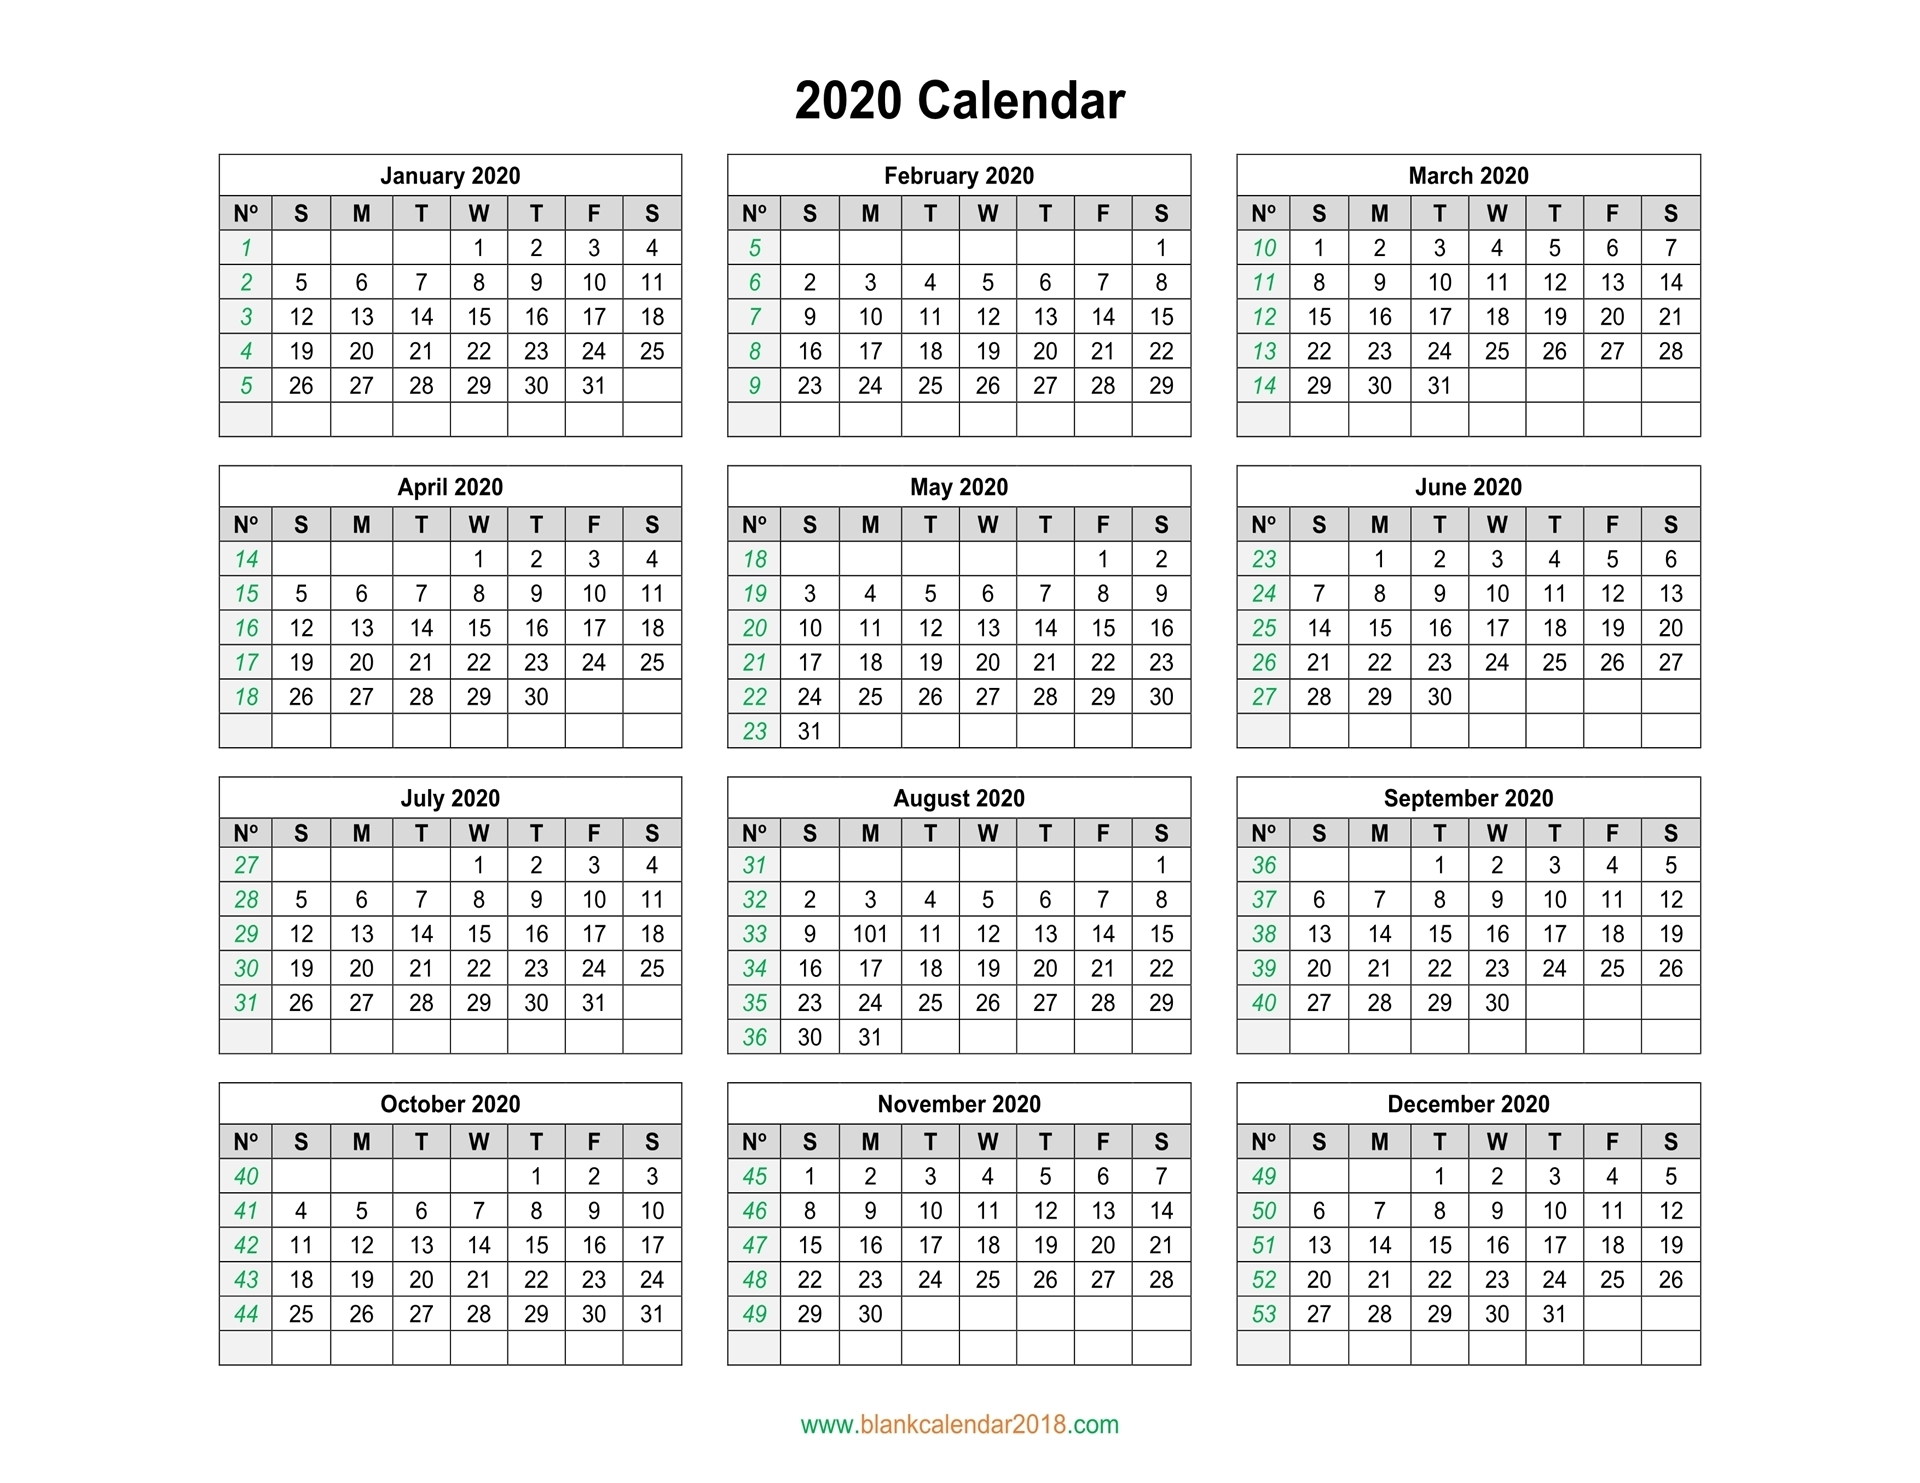 Blank Calendar 2020 with regard to 2020 Calendar To Fill In